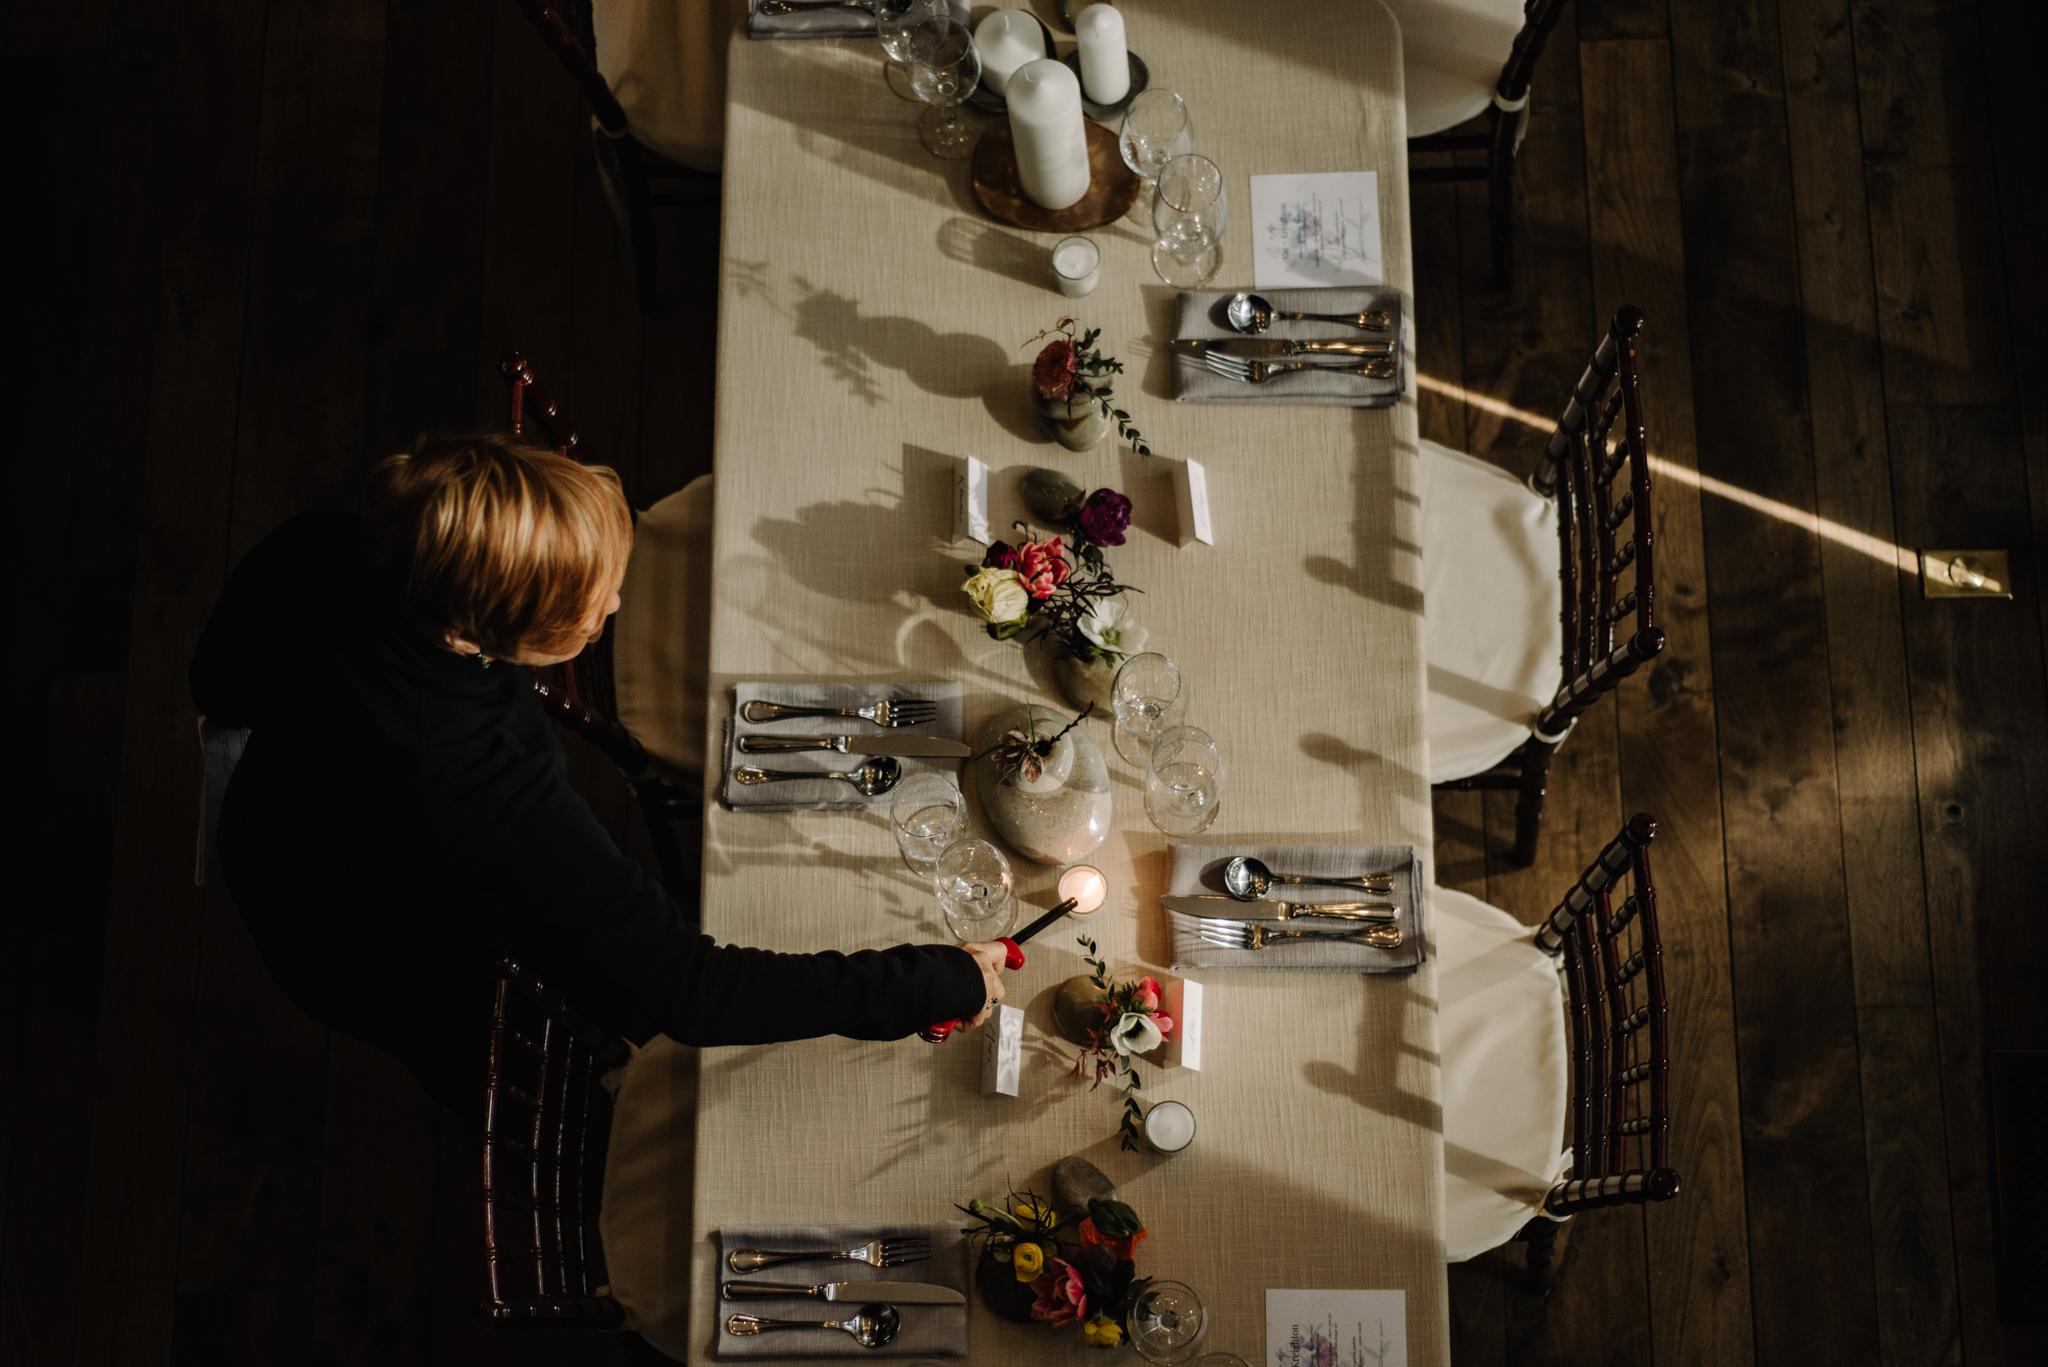 Intimate Dinner Wedding - Small Wedding with Candlelit Dinner - Sperryville Virginia Wedding - Backyard Wedding - Flourish Root Wedding Flowers - White Sails Creative Wedding - Cozy Wedding - Casual Wedding - Intimate Wedding_5.jpg